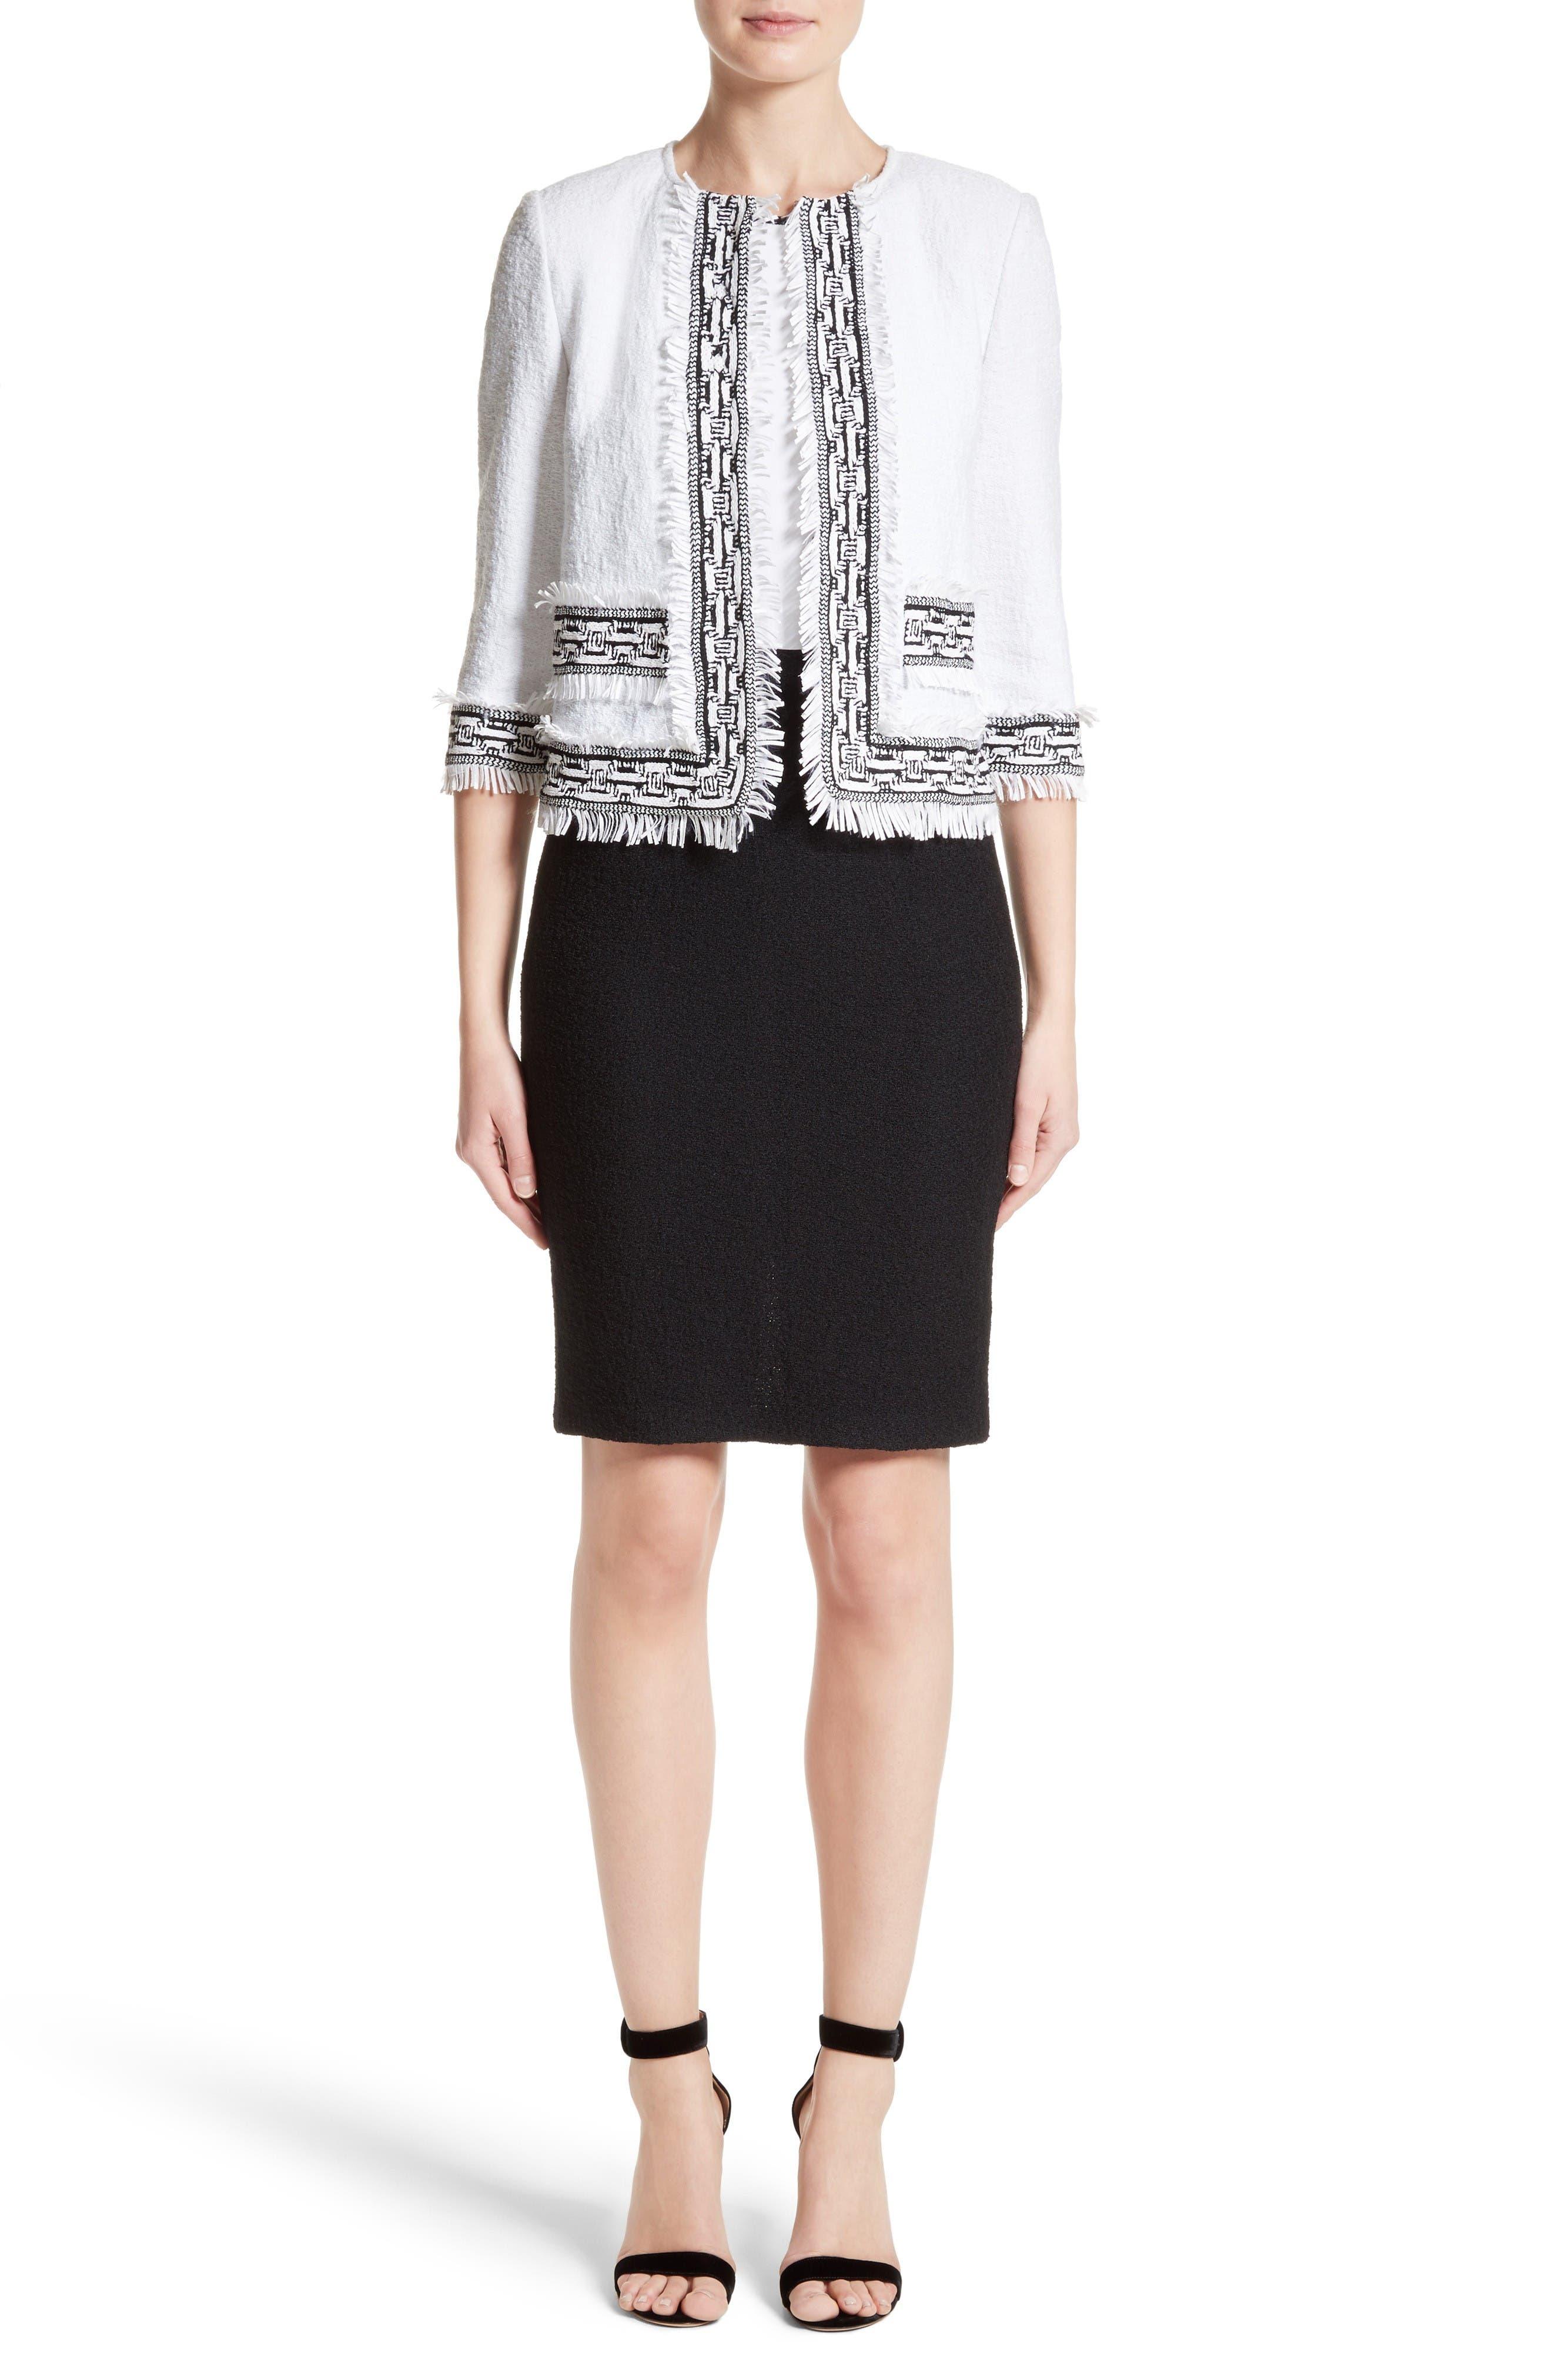 Cady Bodice Clair Knit Dress,                             Alternate thumbnail 8, color,                             Bianco/ Caviar